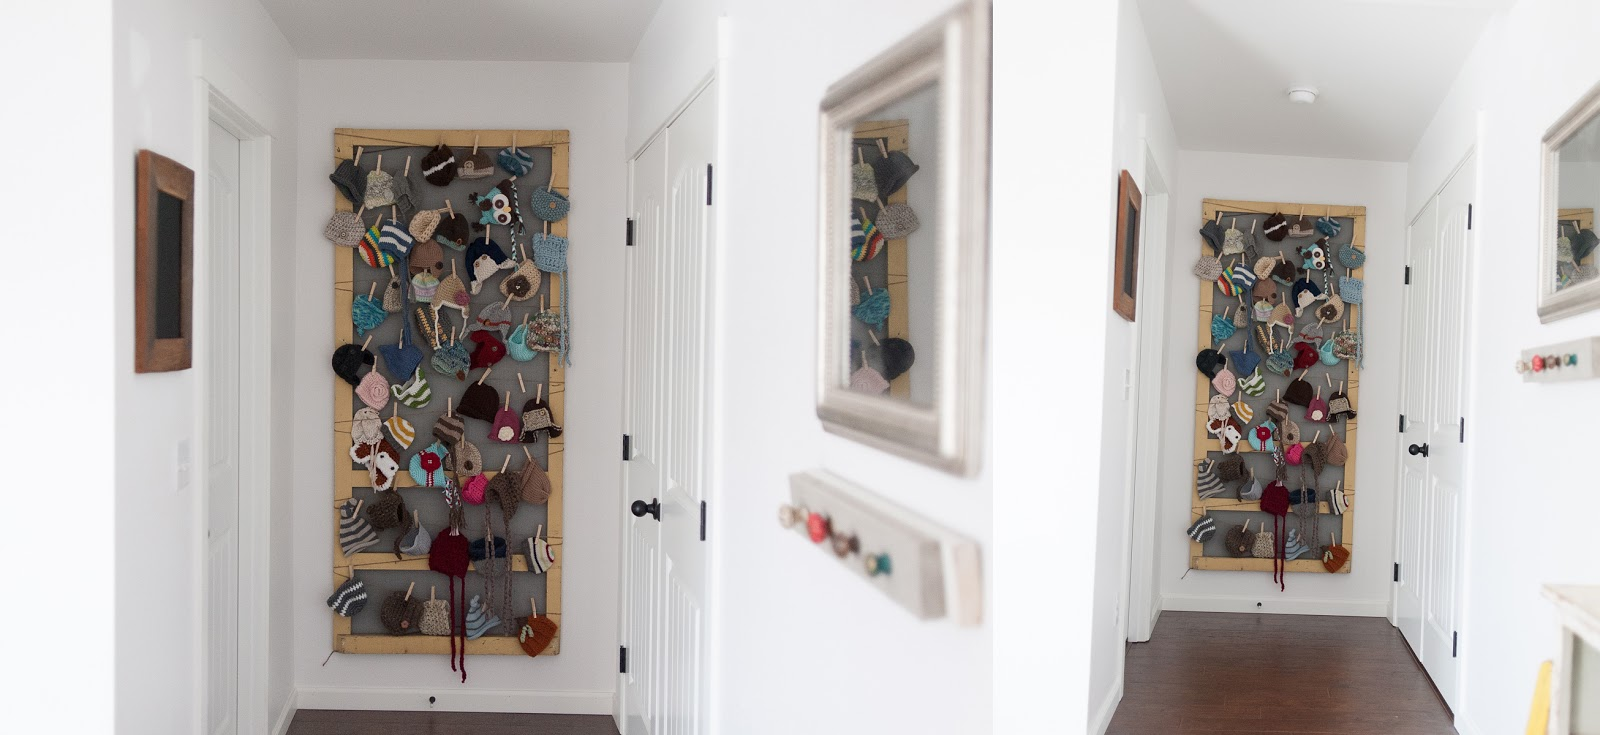 A screen door showcase newborn props for babies